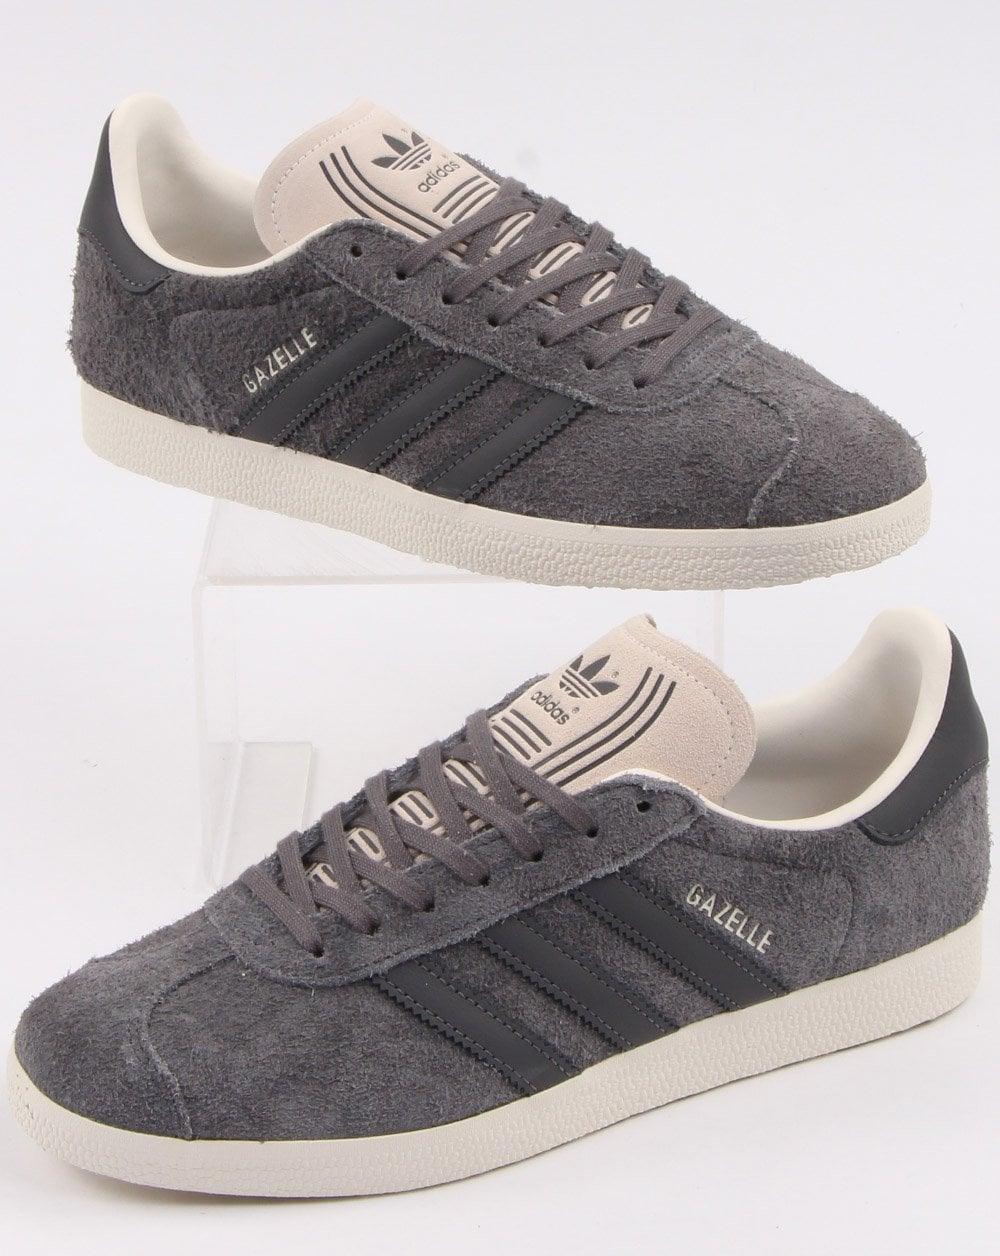 Adidas Gazelle Trainers Grey/White